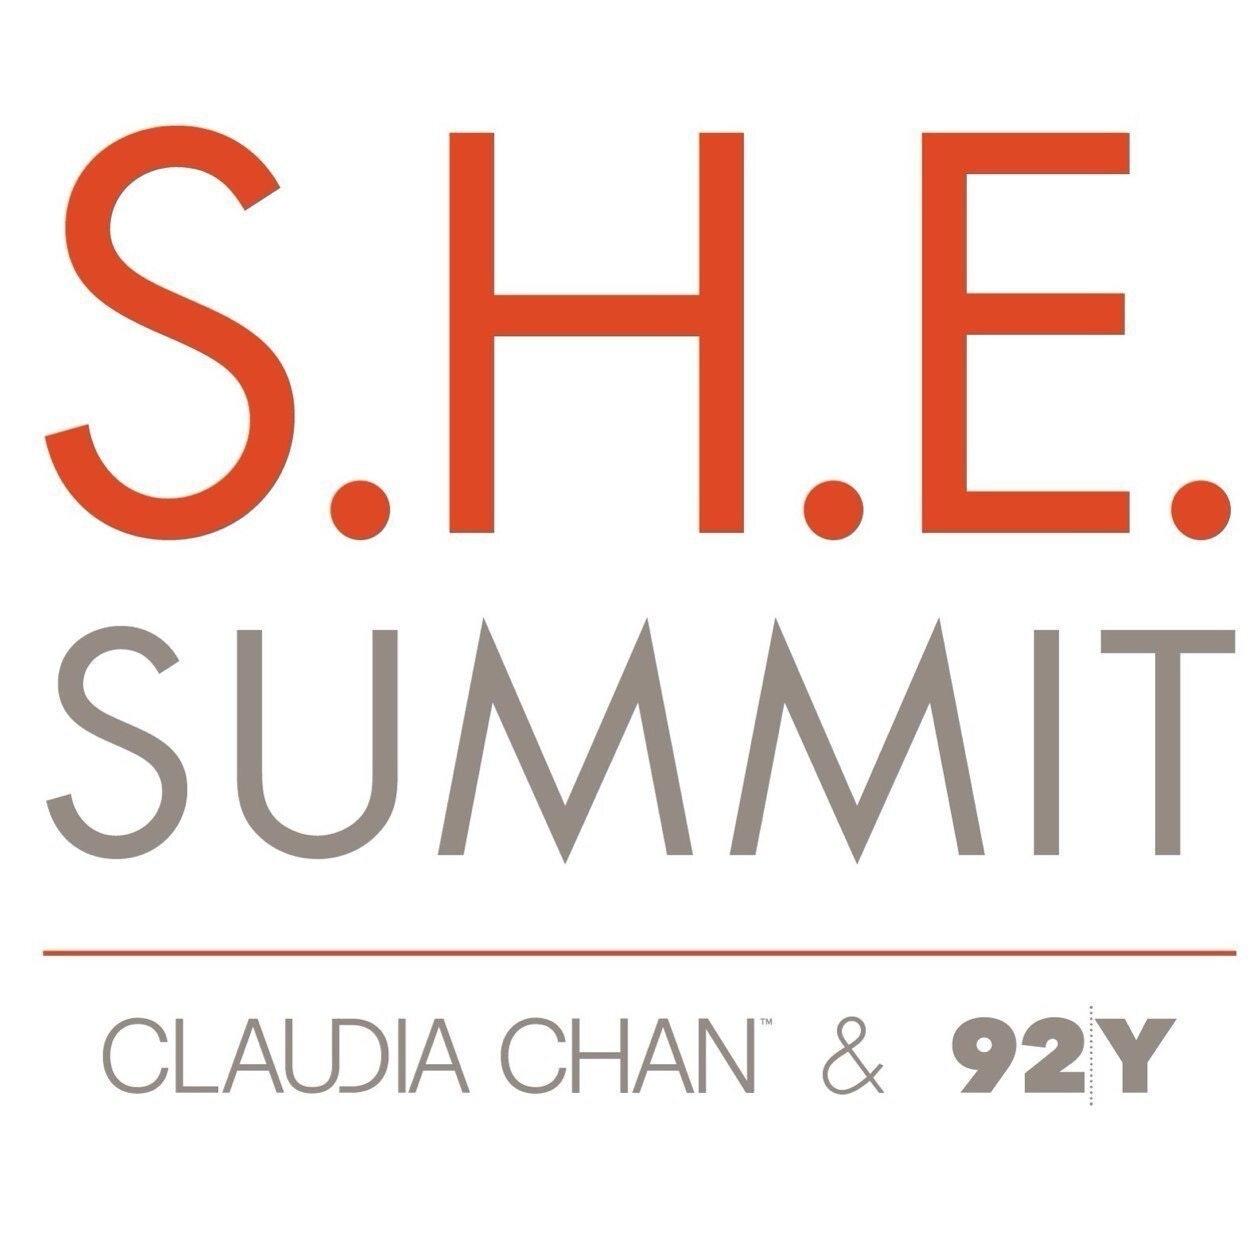 ClaudiaChan.com